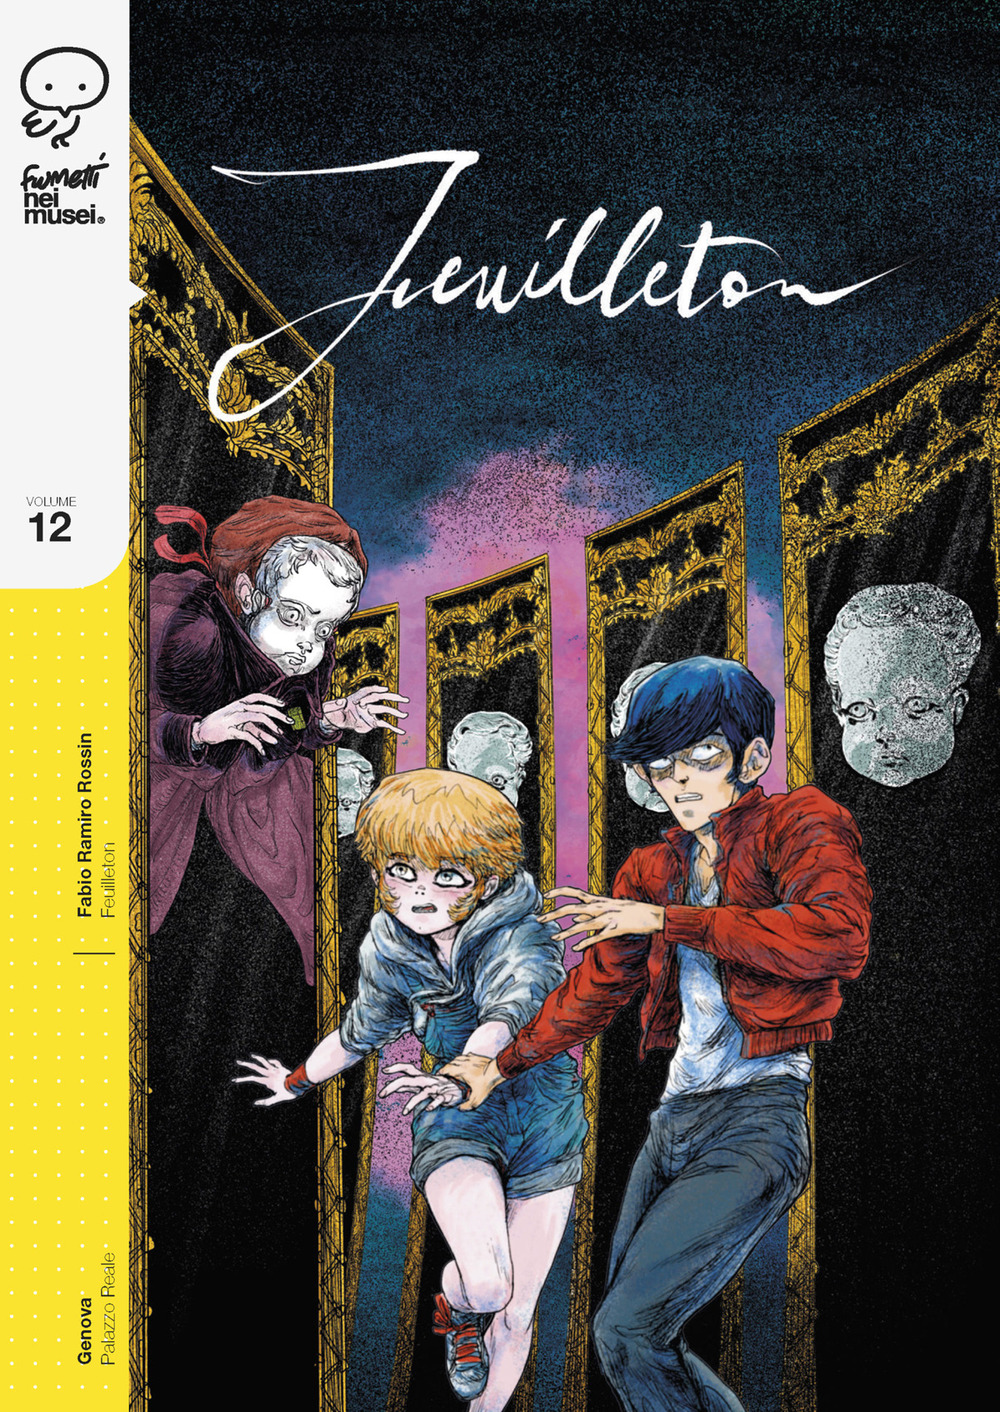 FEUILLETON vol.12 - Fabio Ramiro Rossin - 9788876184826